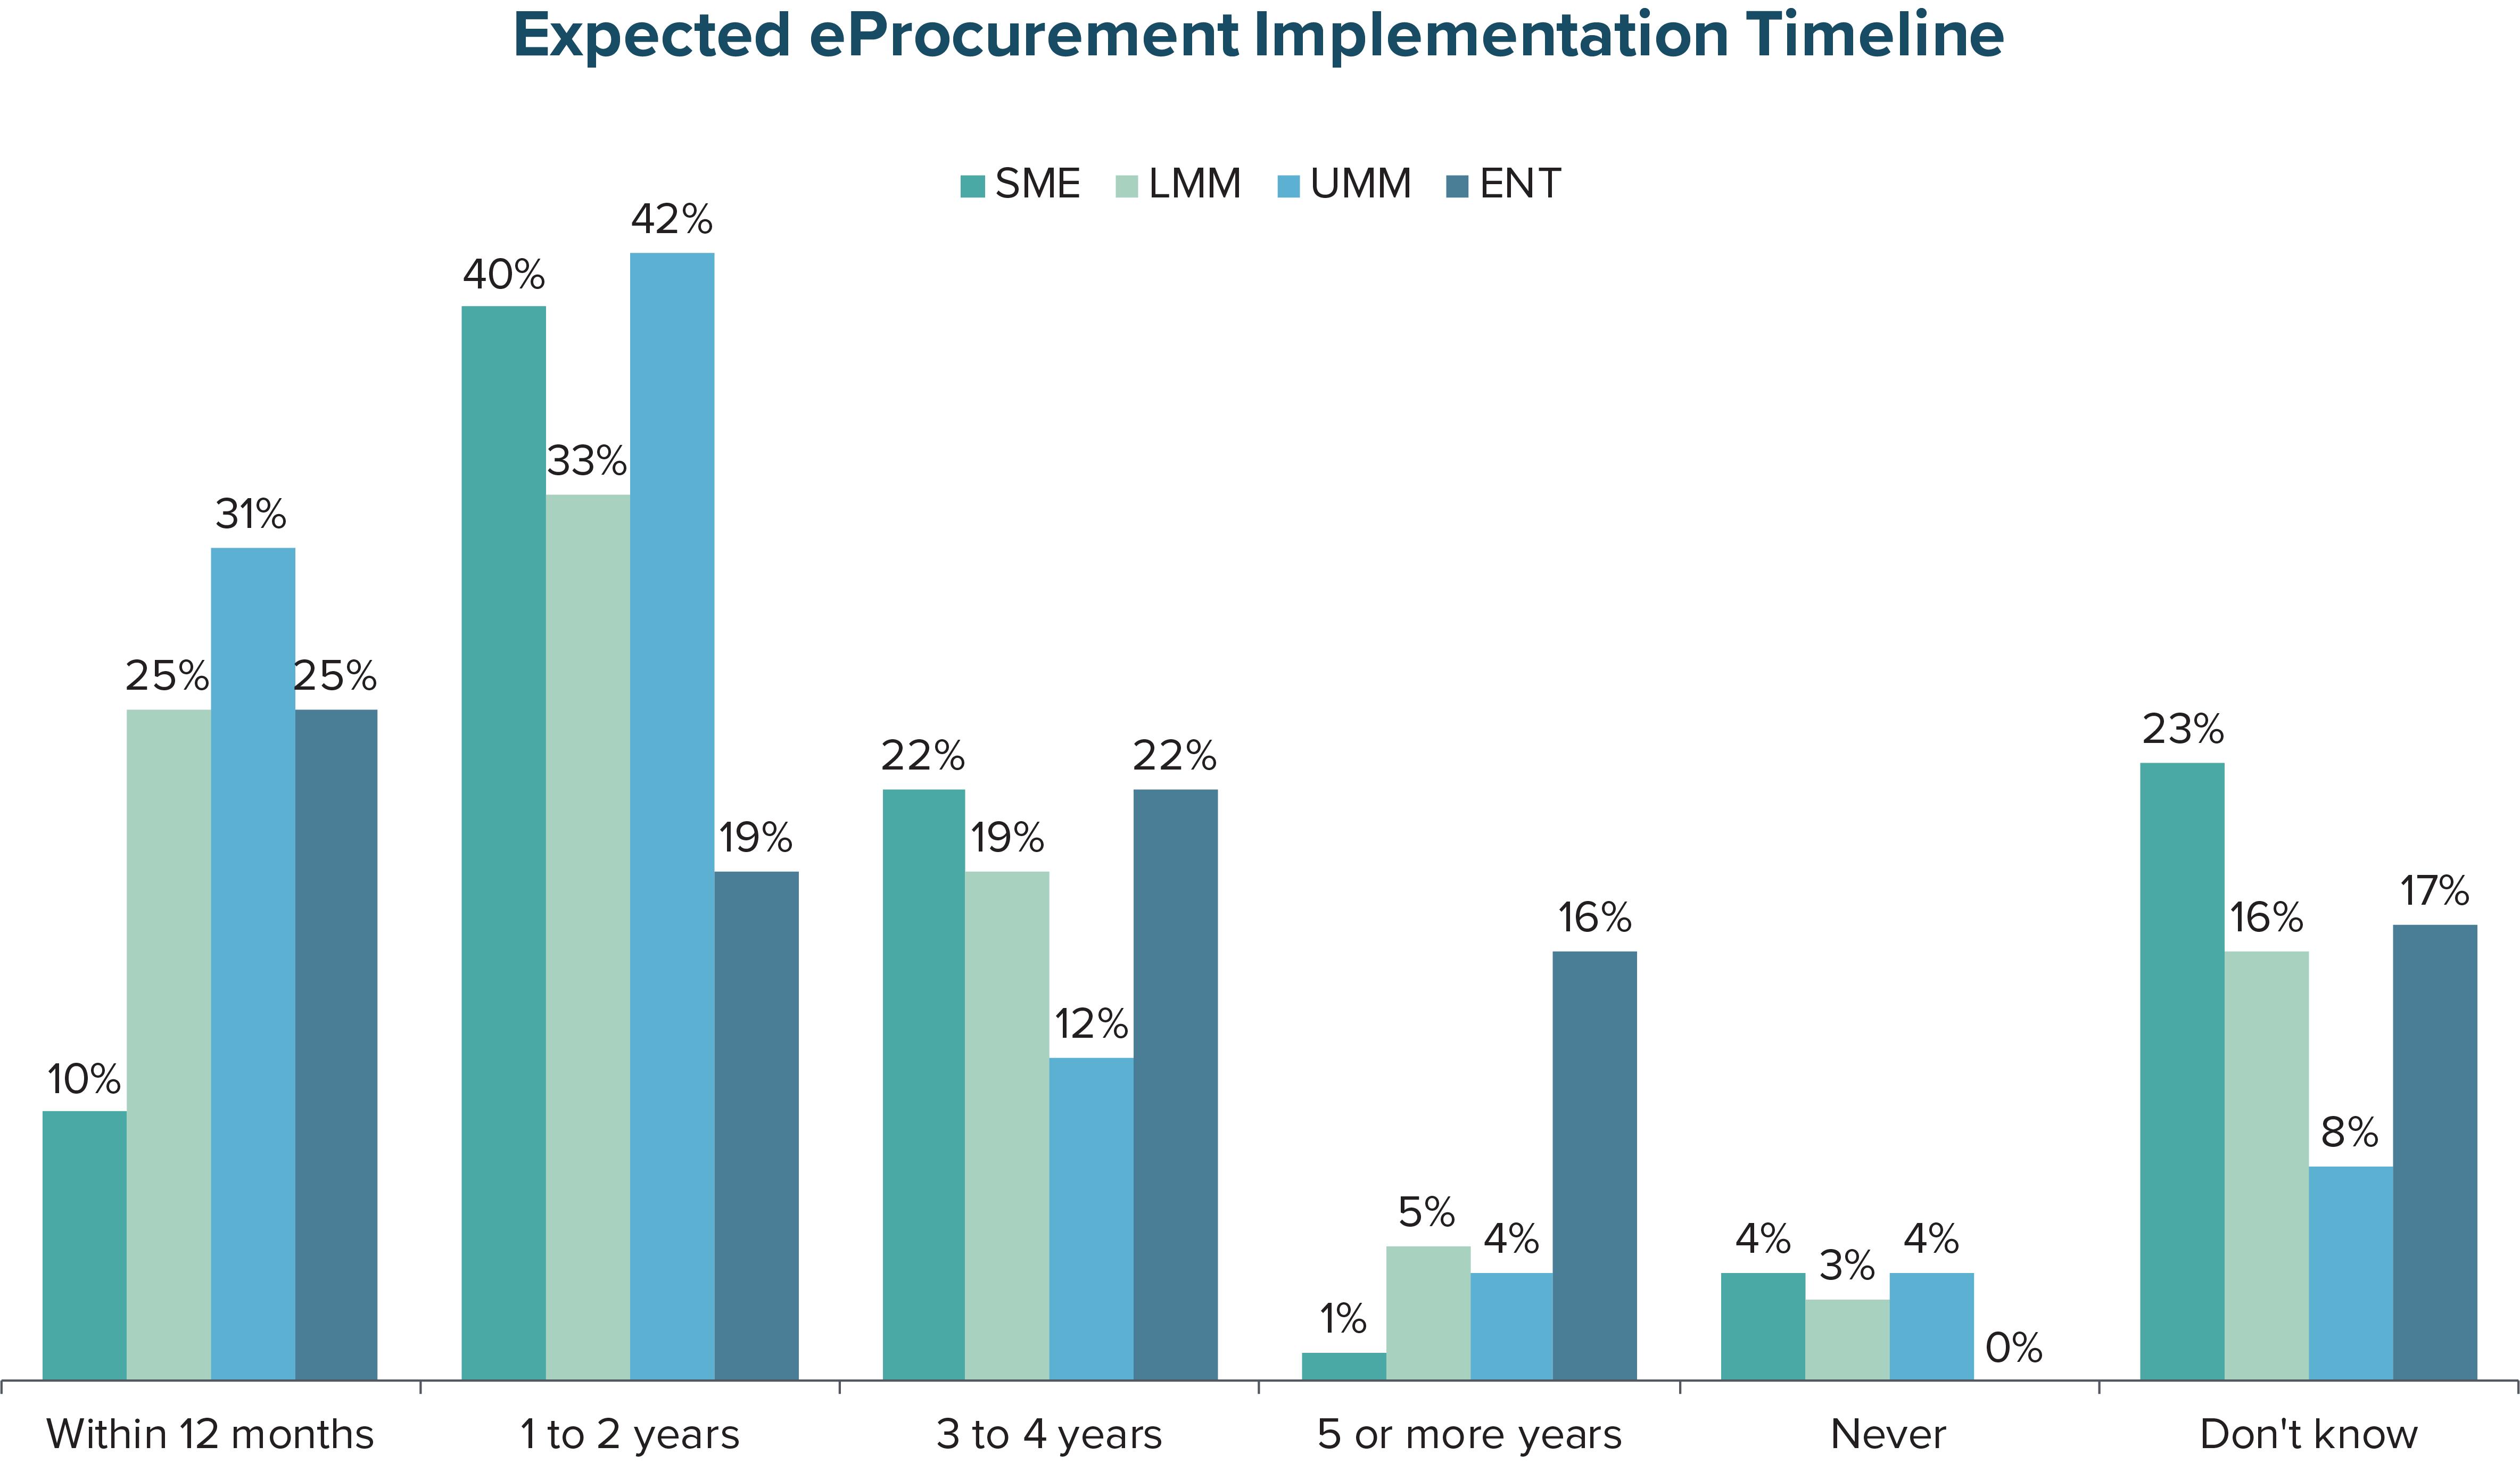 Expected eProcurement Implementation Timeline